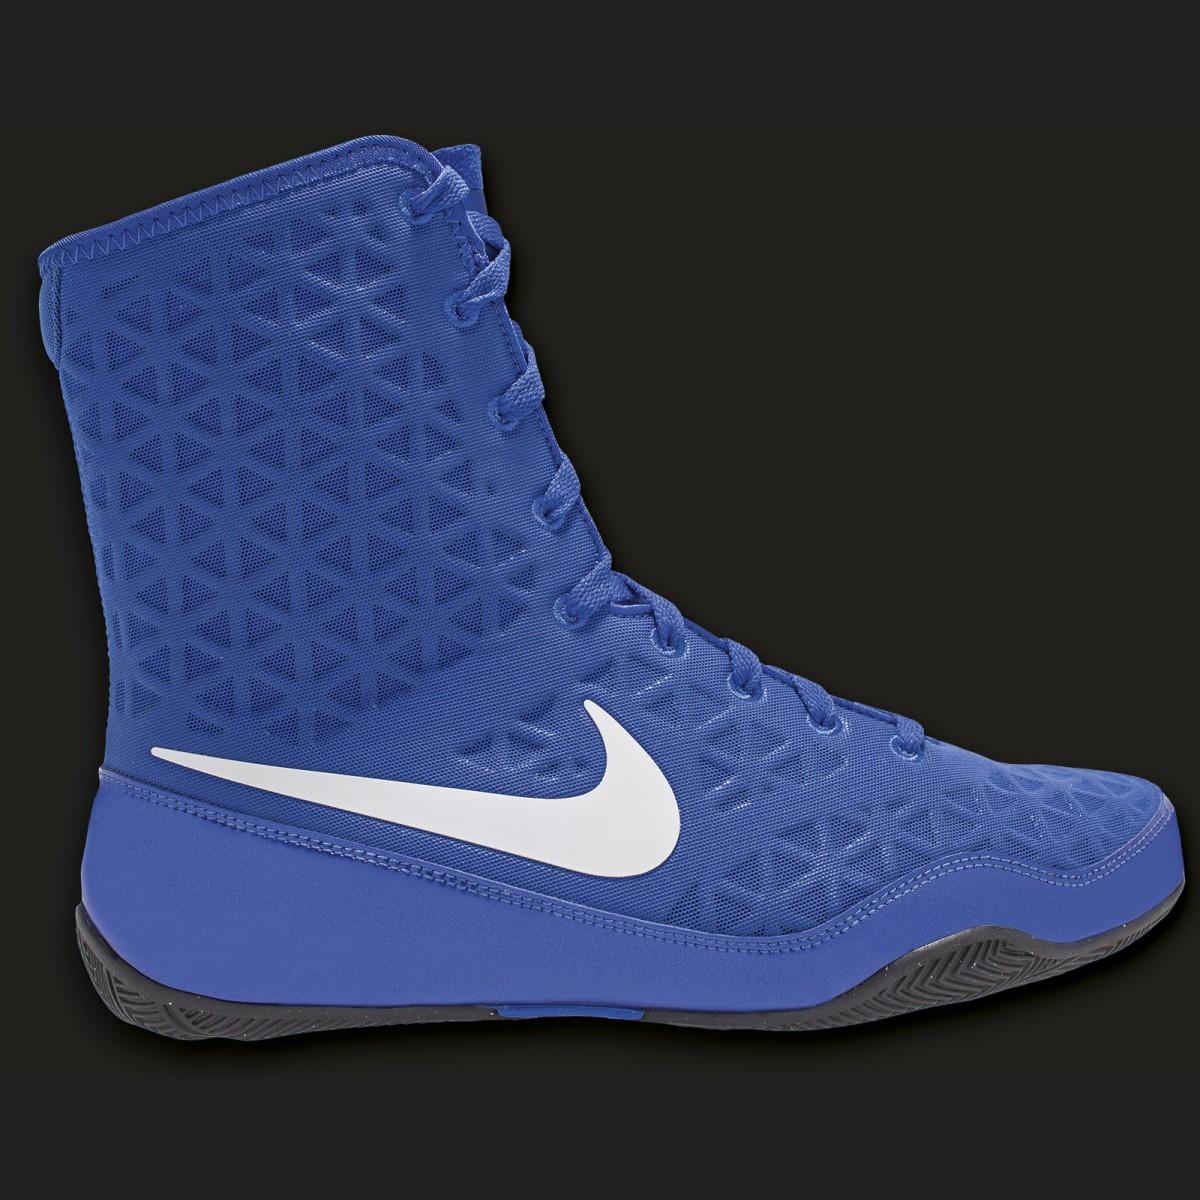 5e91f7850def Nike boxing shoes